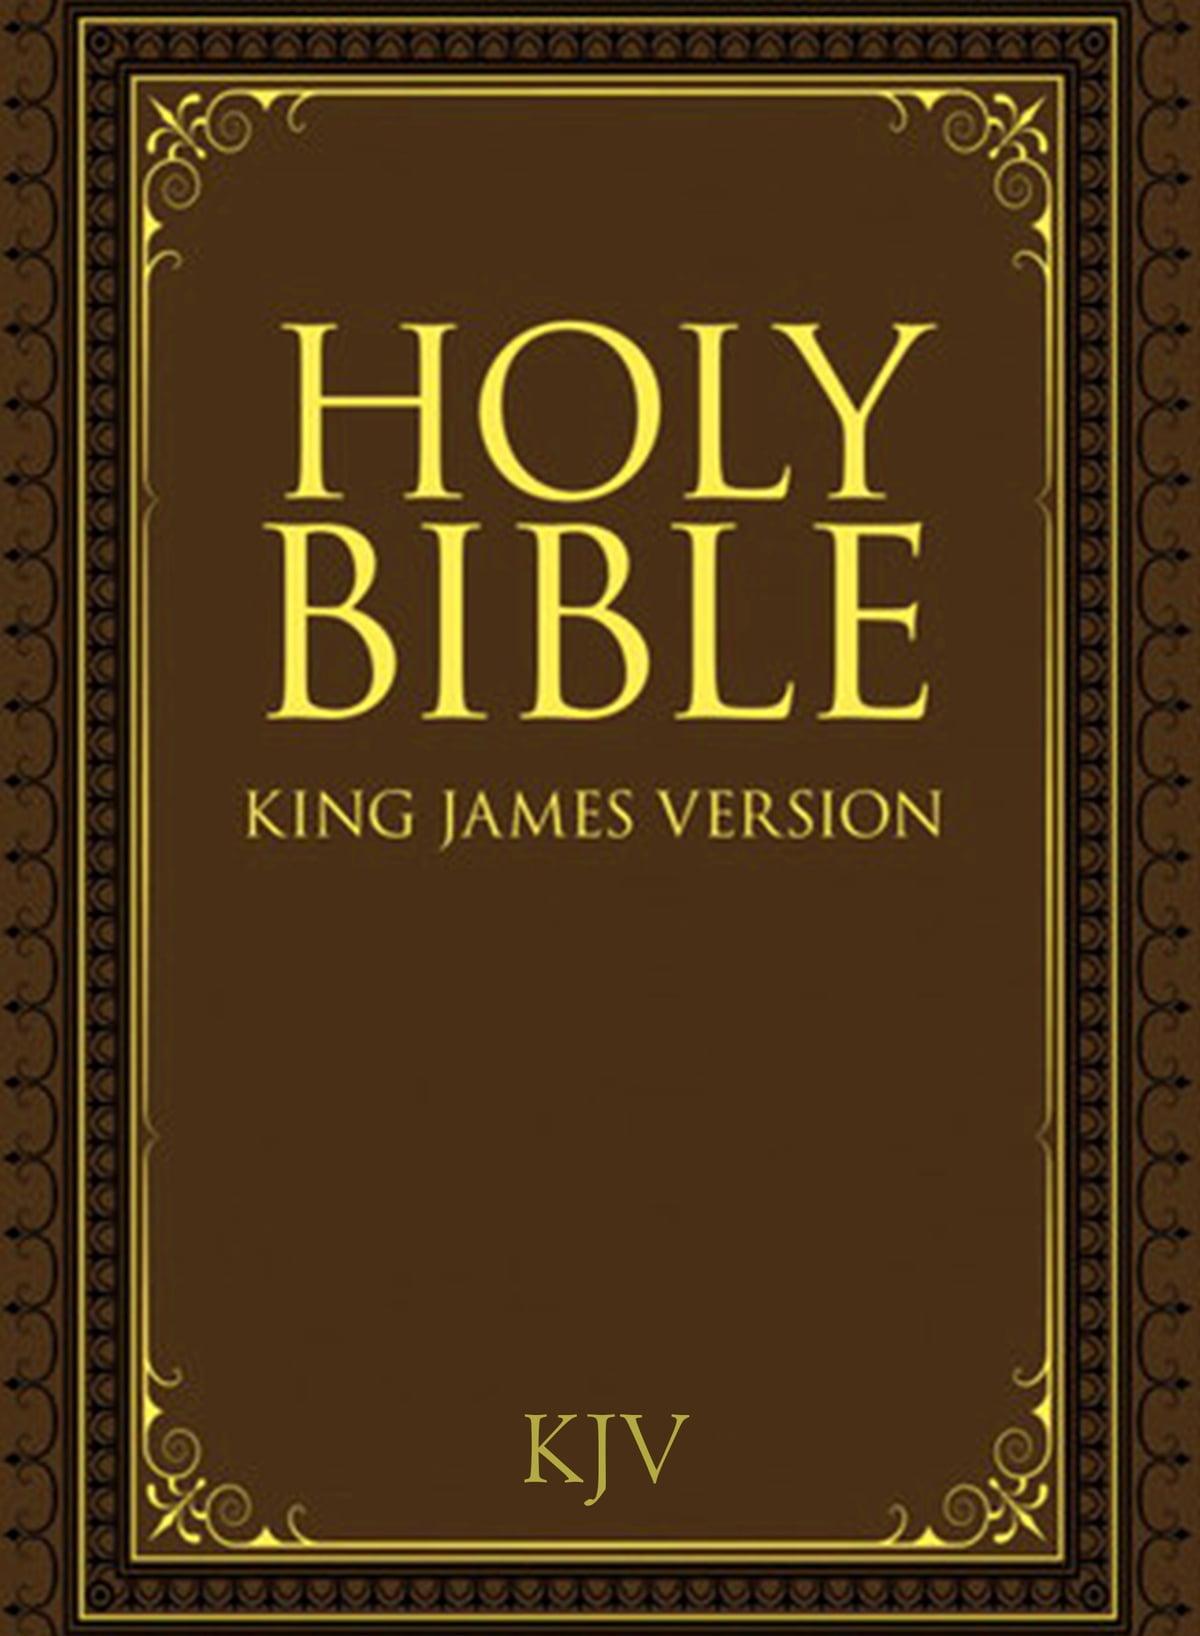 Bible King James Version Authorized Kjv Best Bible